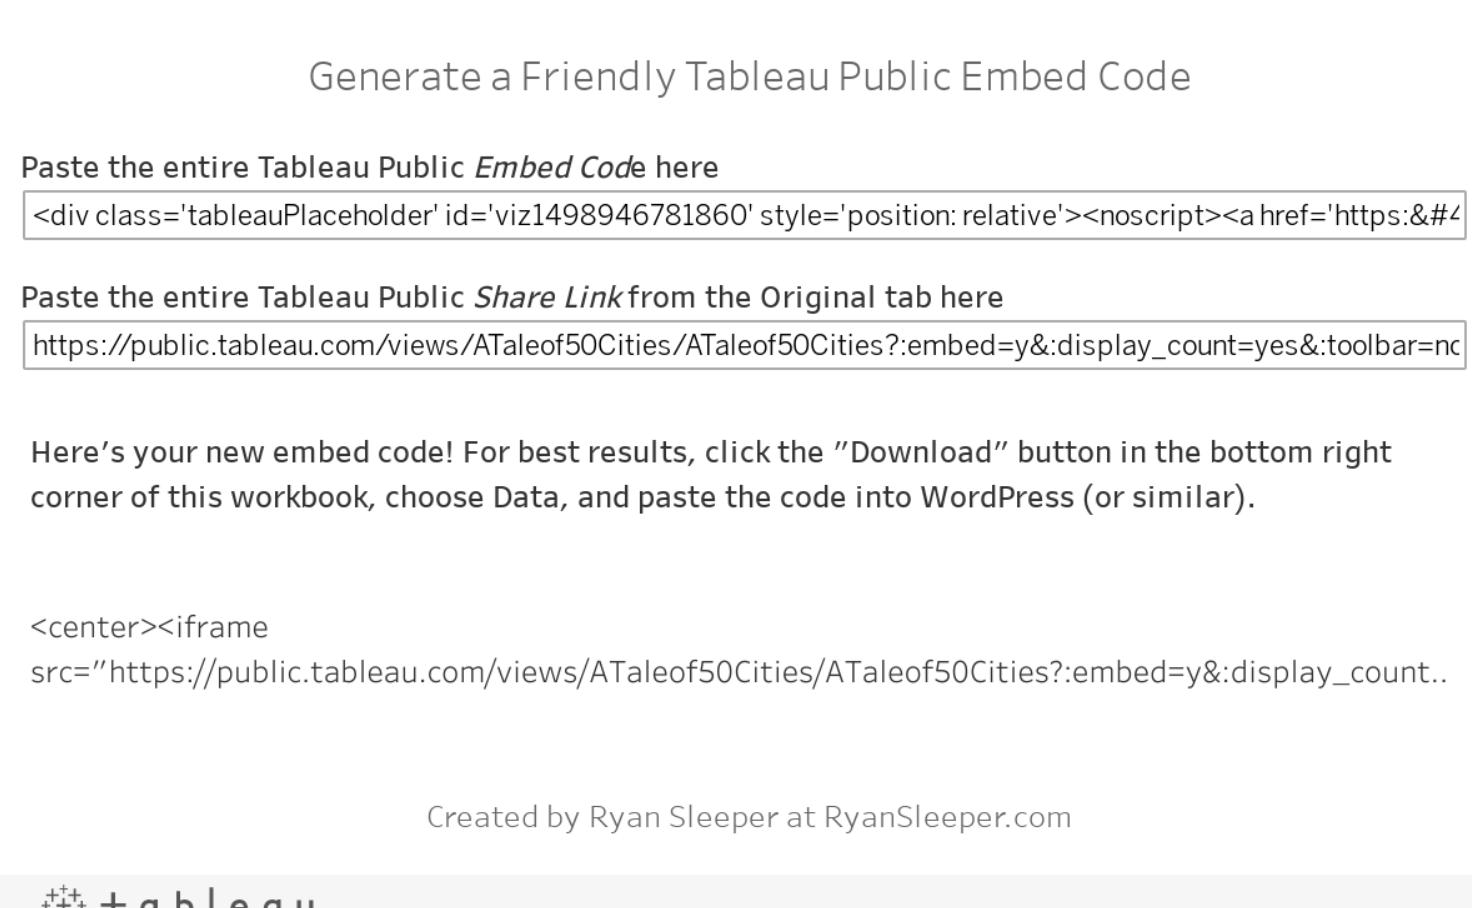 Generate a Friendly Tableau Public Embed Code - Ryan Sleeper